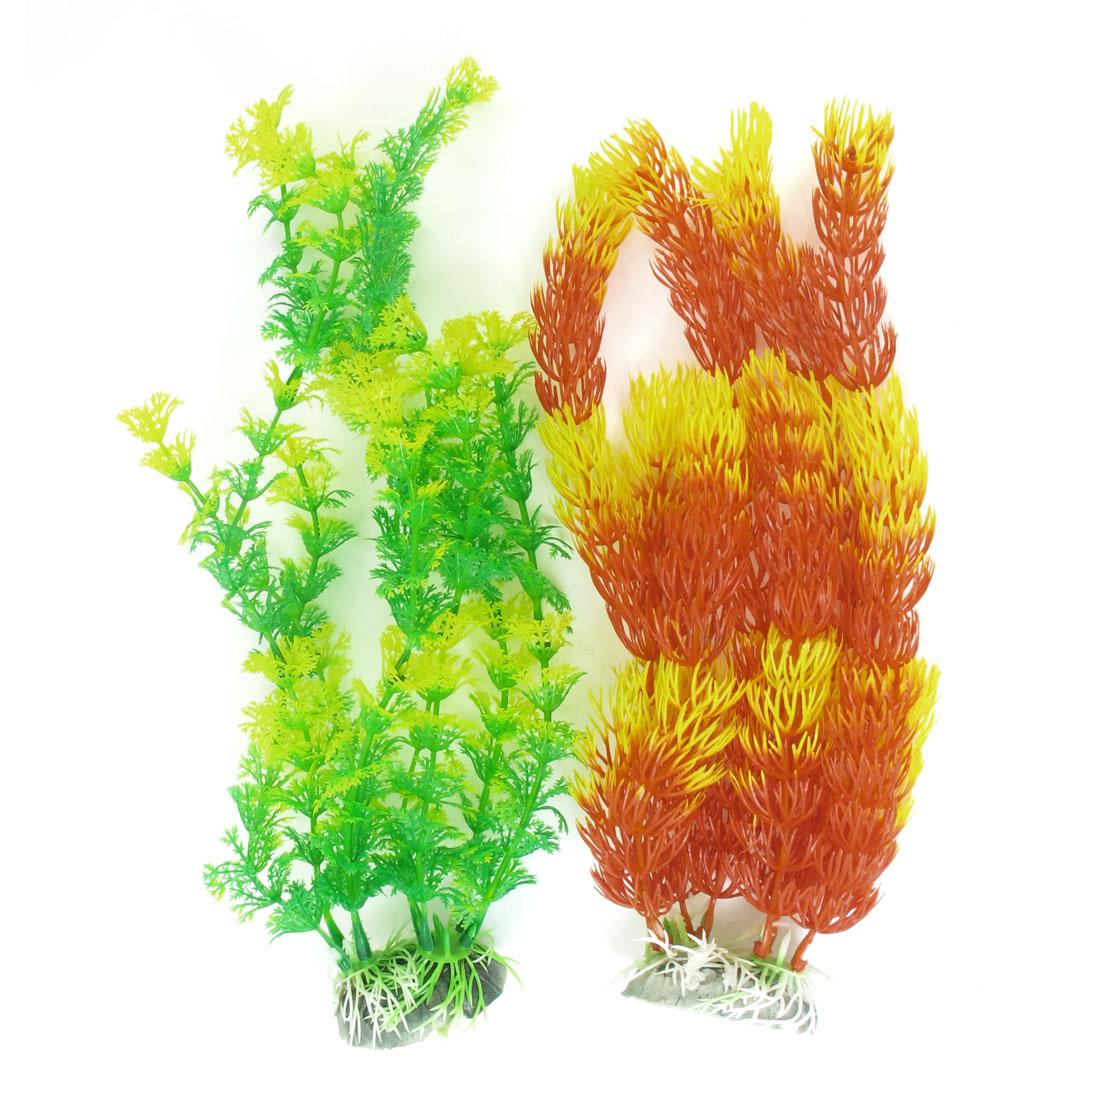 "2 Pcs Orange Red Yellow Emulational Fish Tank Aquarium Grass Decor 10.6""r 10.6"" High"